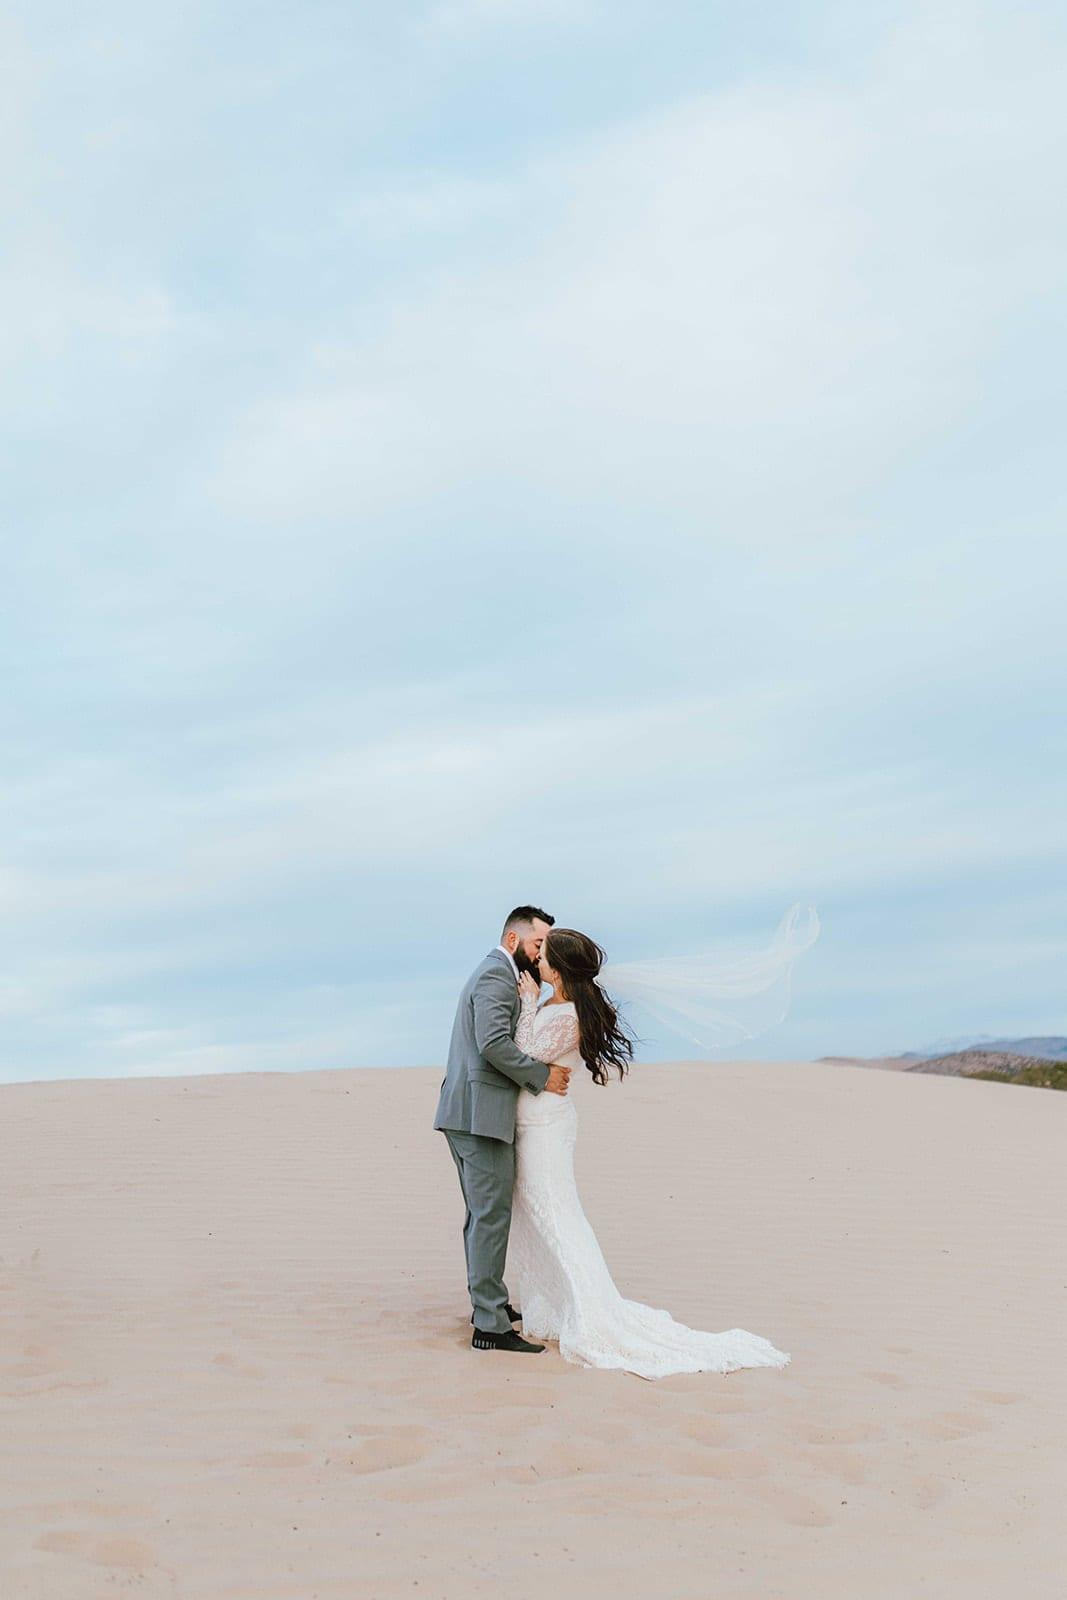 Love Brittny wedding photography sand dunes